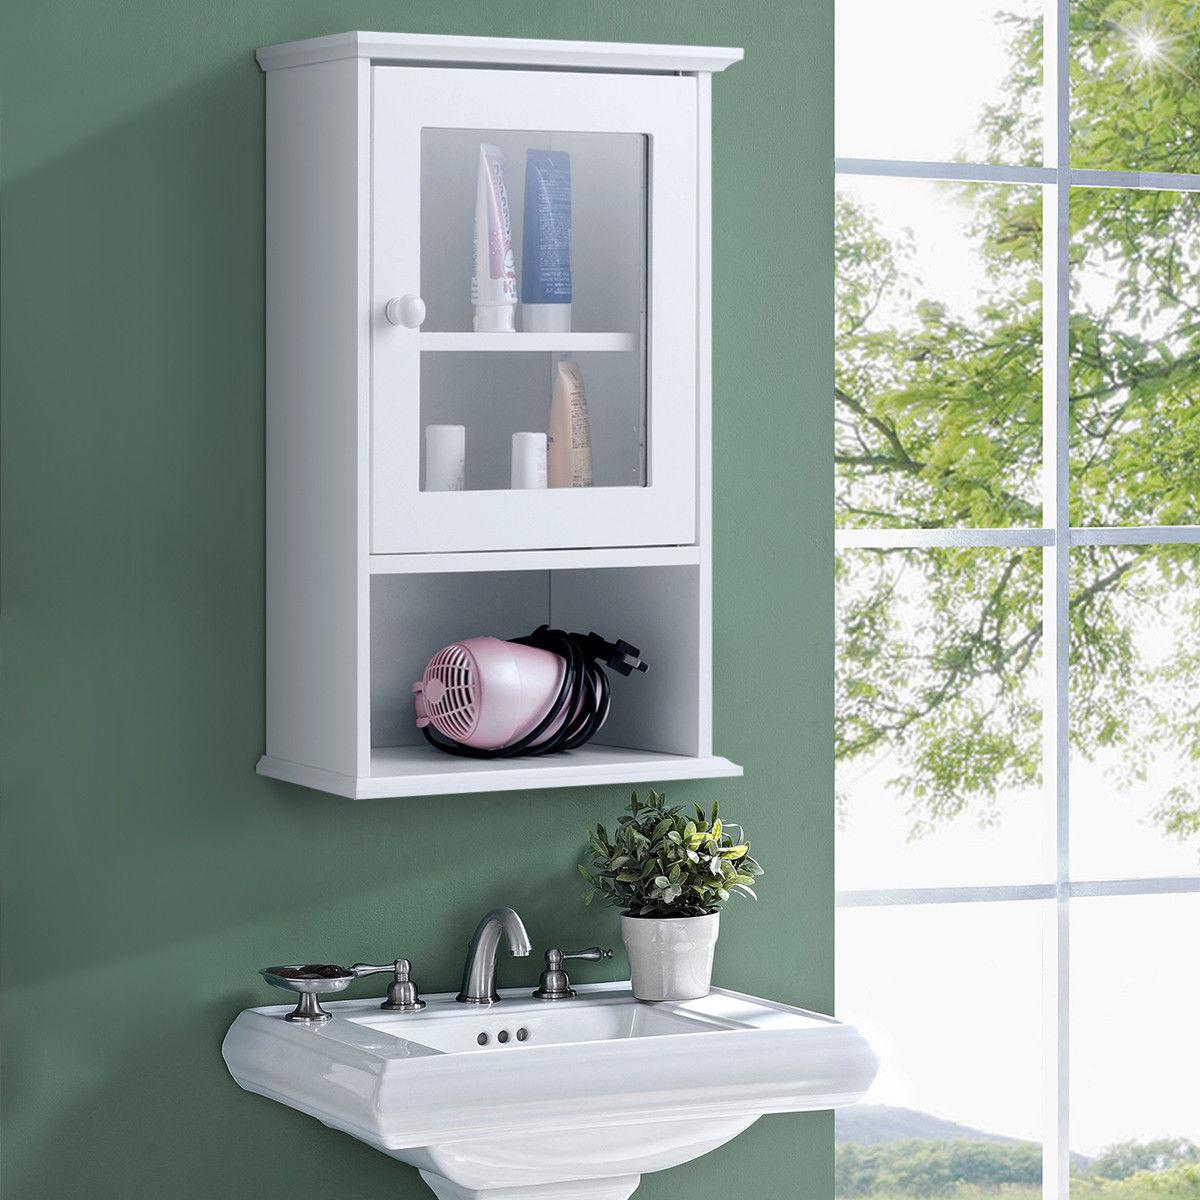 Gymax Wall Mounted Bathroom Cabinet Storage Organize Hanging Medicine Adjustable Shelf